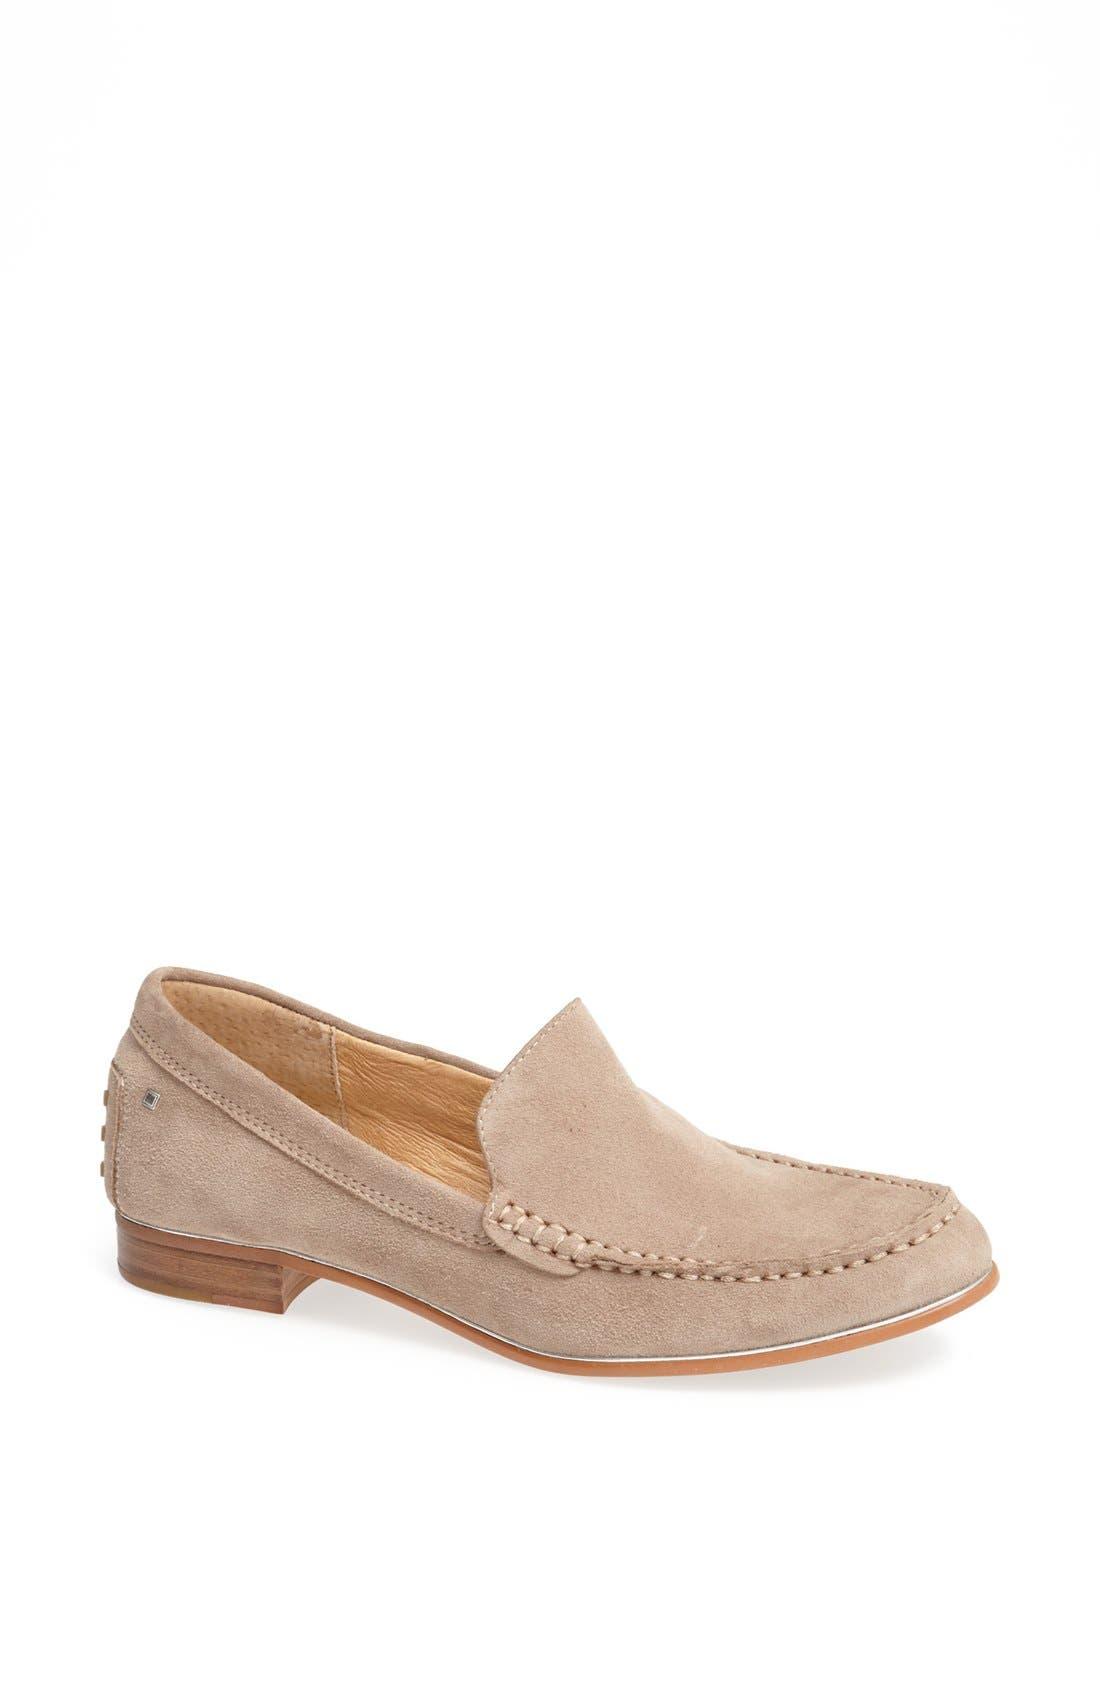 Main Image - Dolce Vita 'Venka' Leather Flat